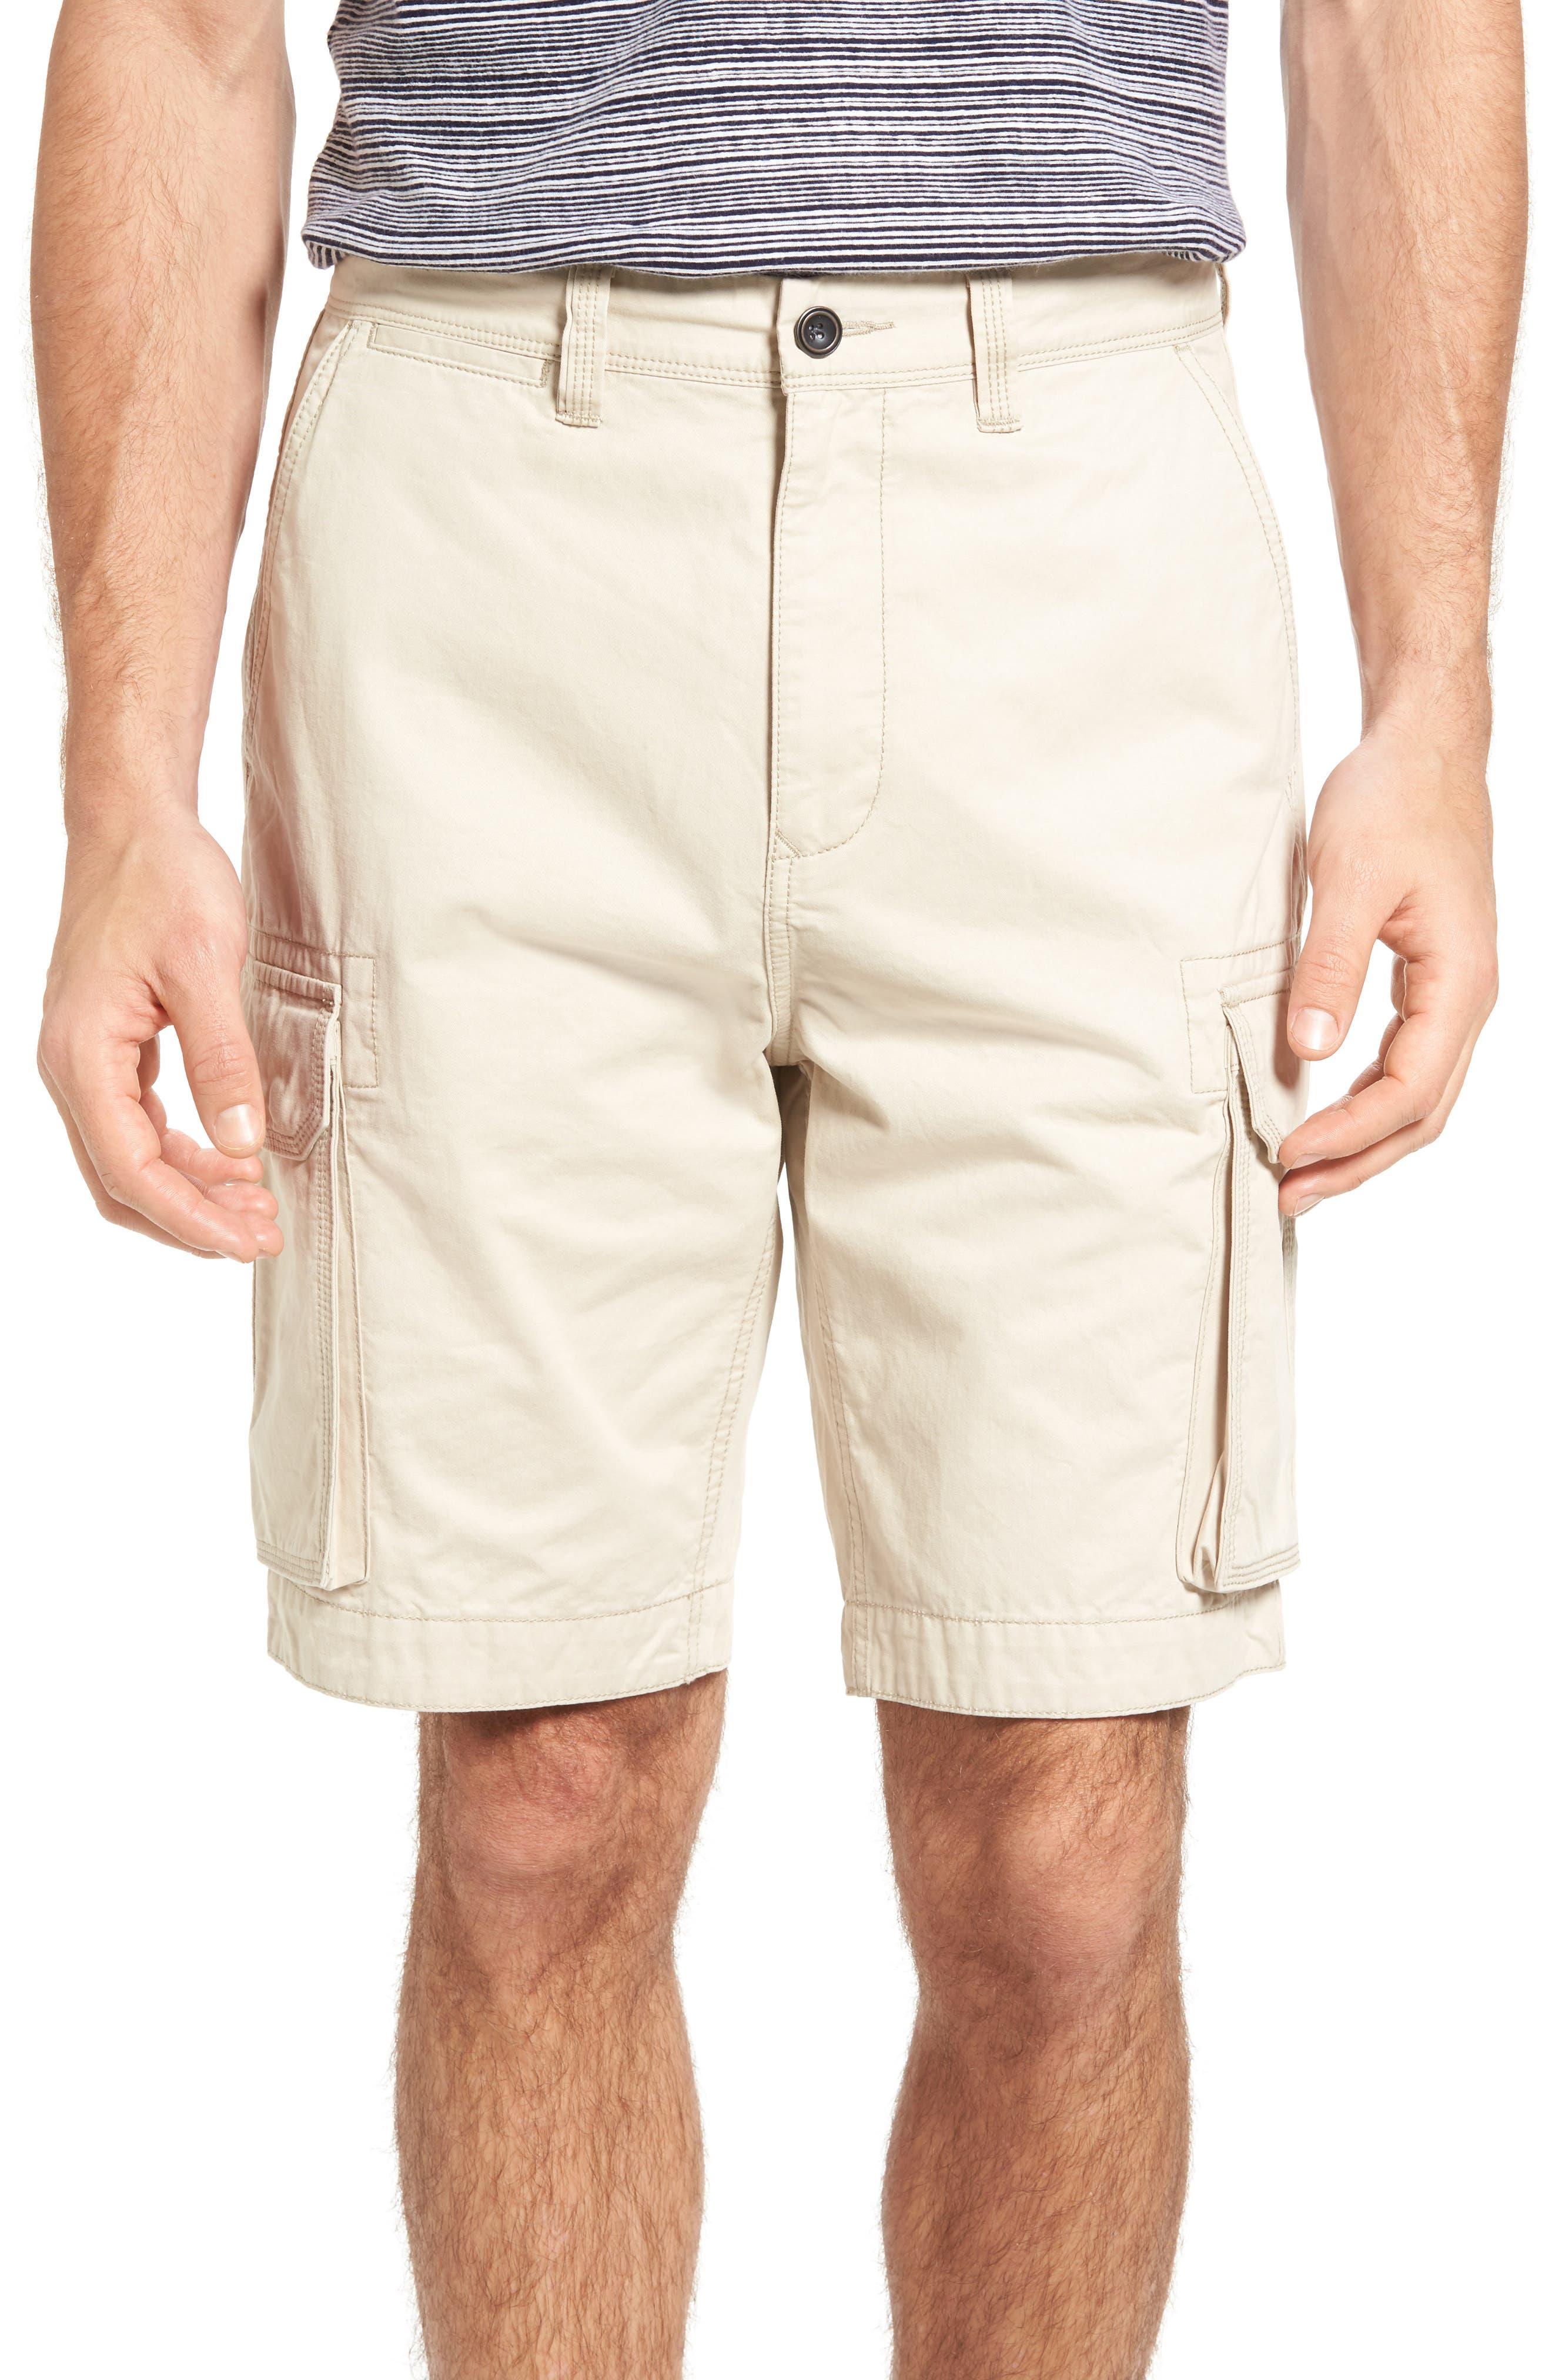 Homewood Utility Shorts,                             Main thumbnail 1, color,                             252